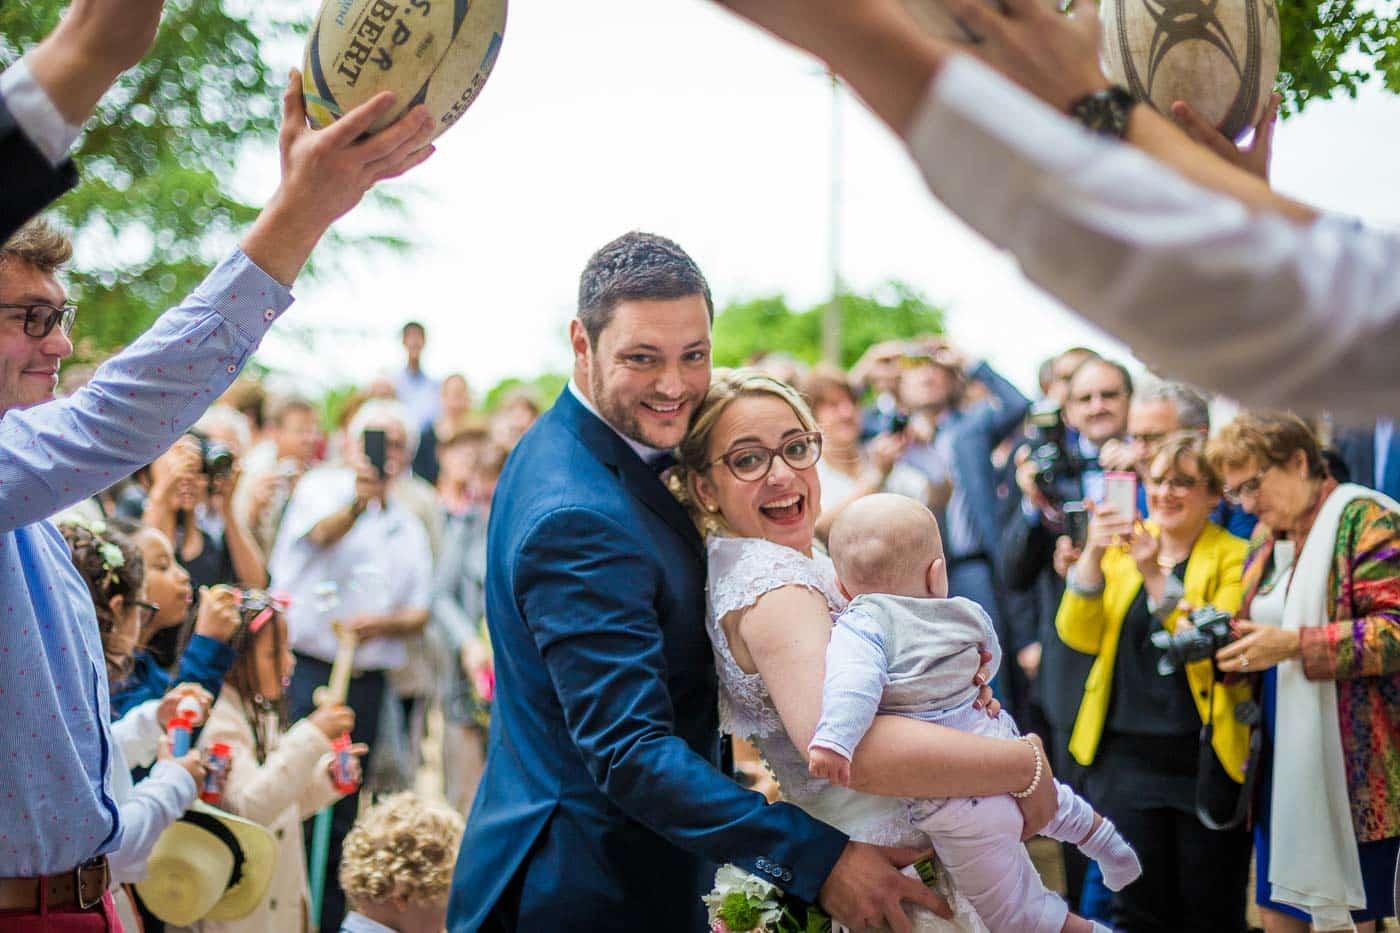 raphai-bernus-photos-de-mariage-5